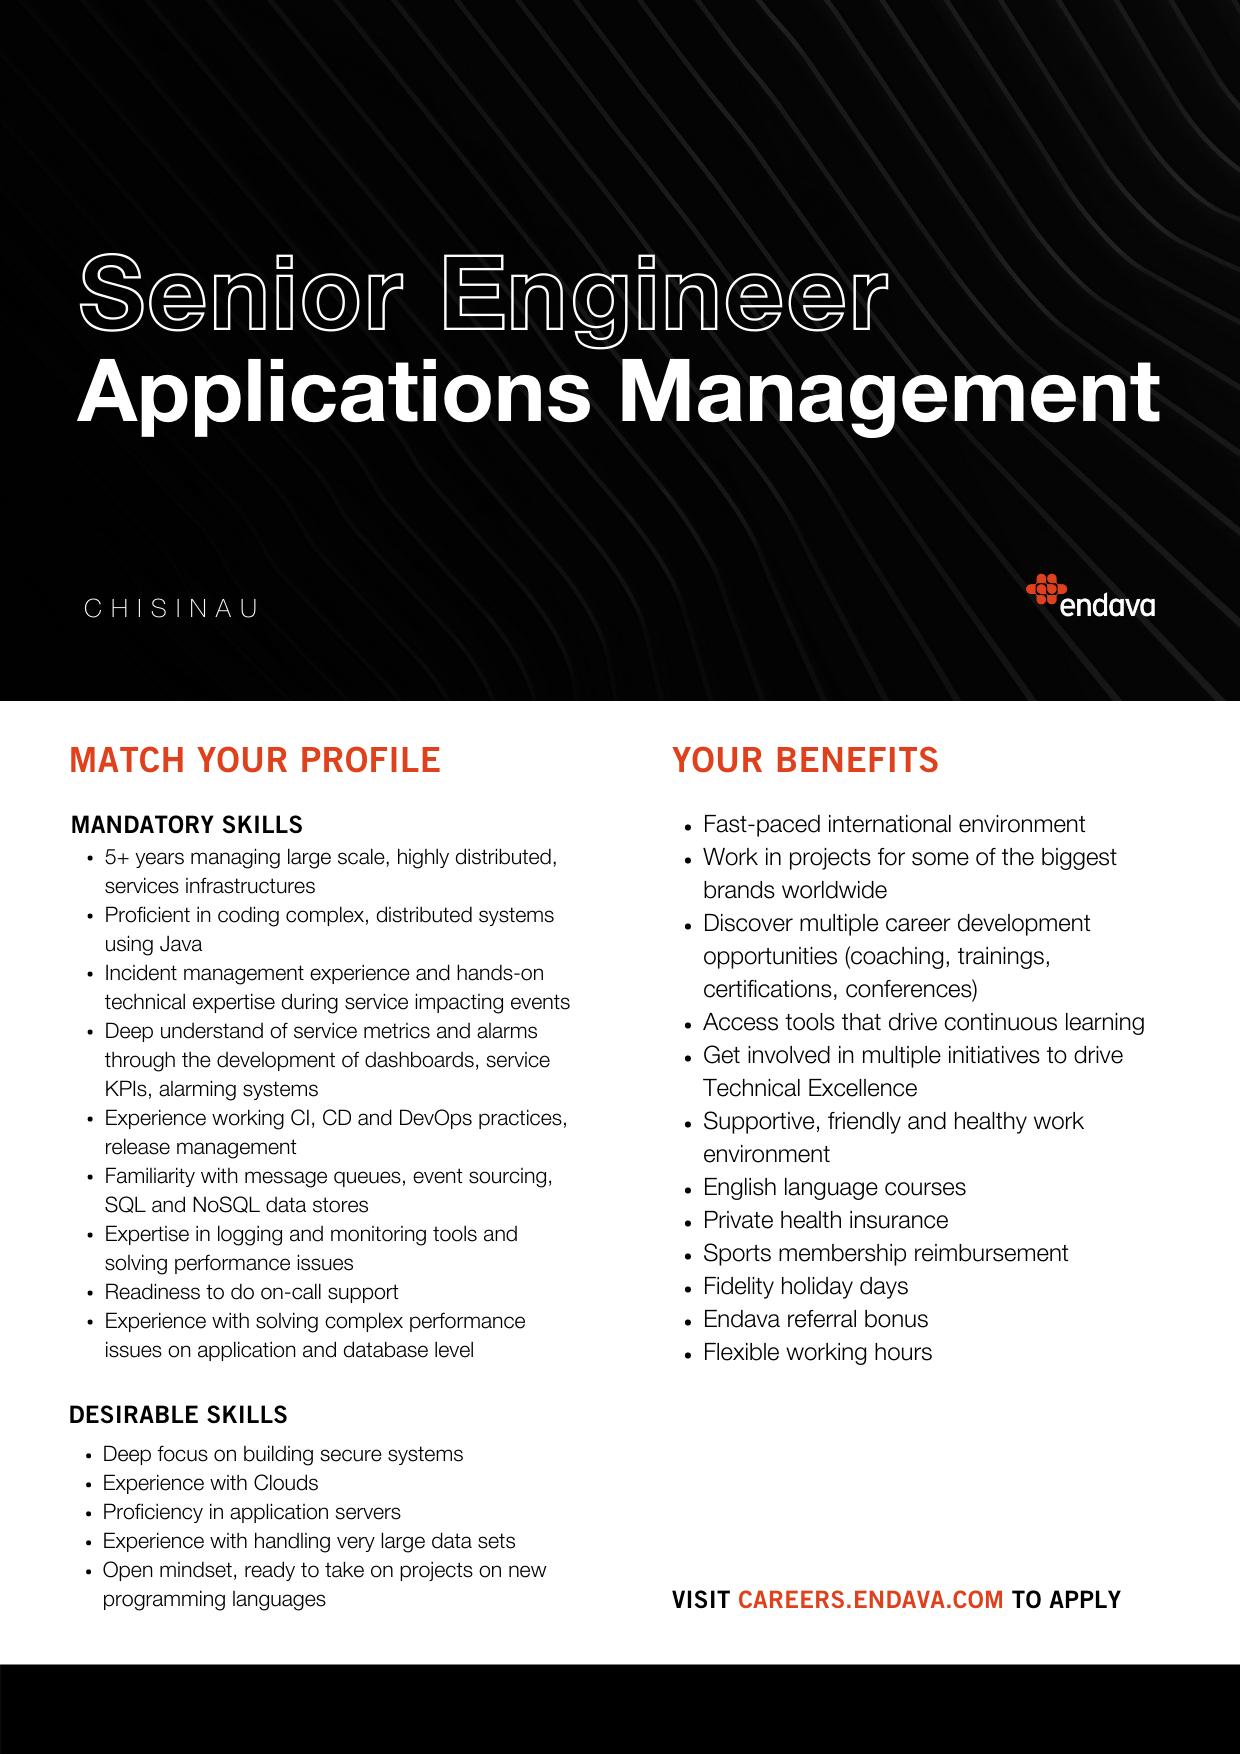 Senior Engineer Applications Management at Endava